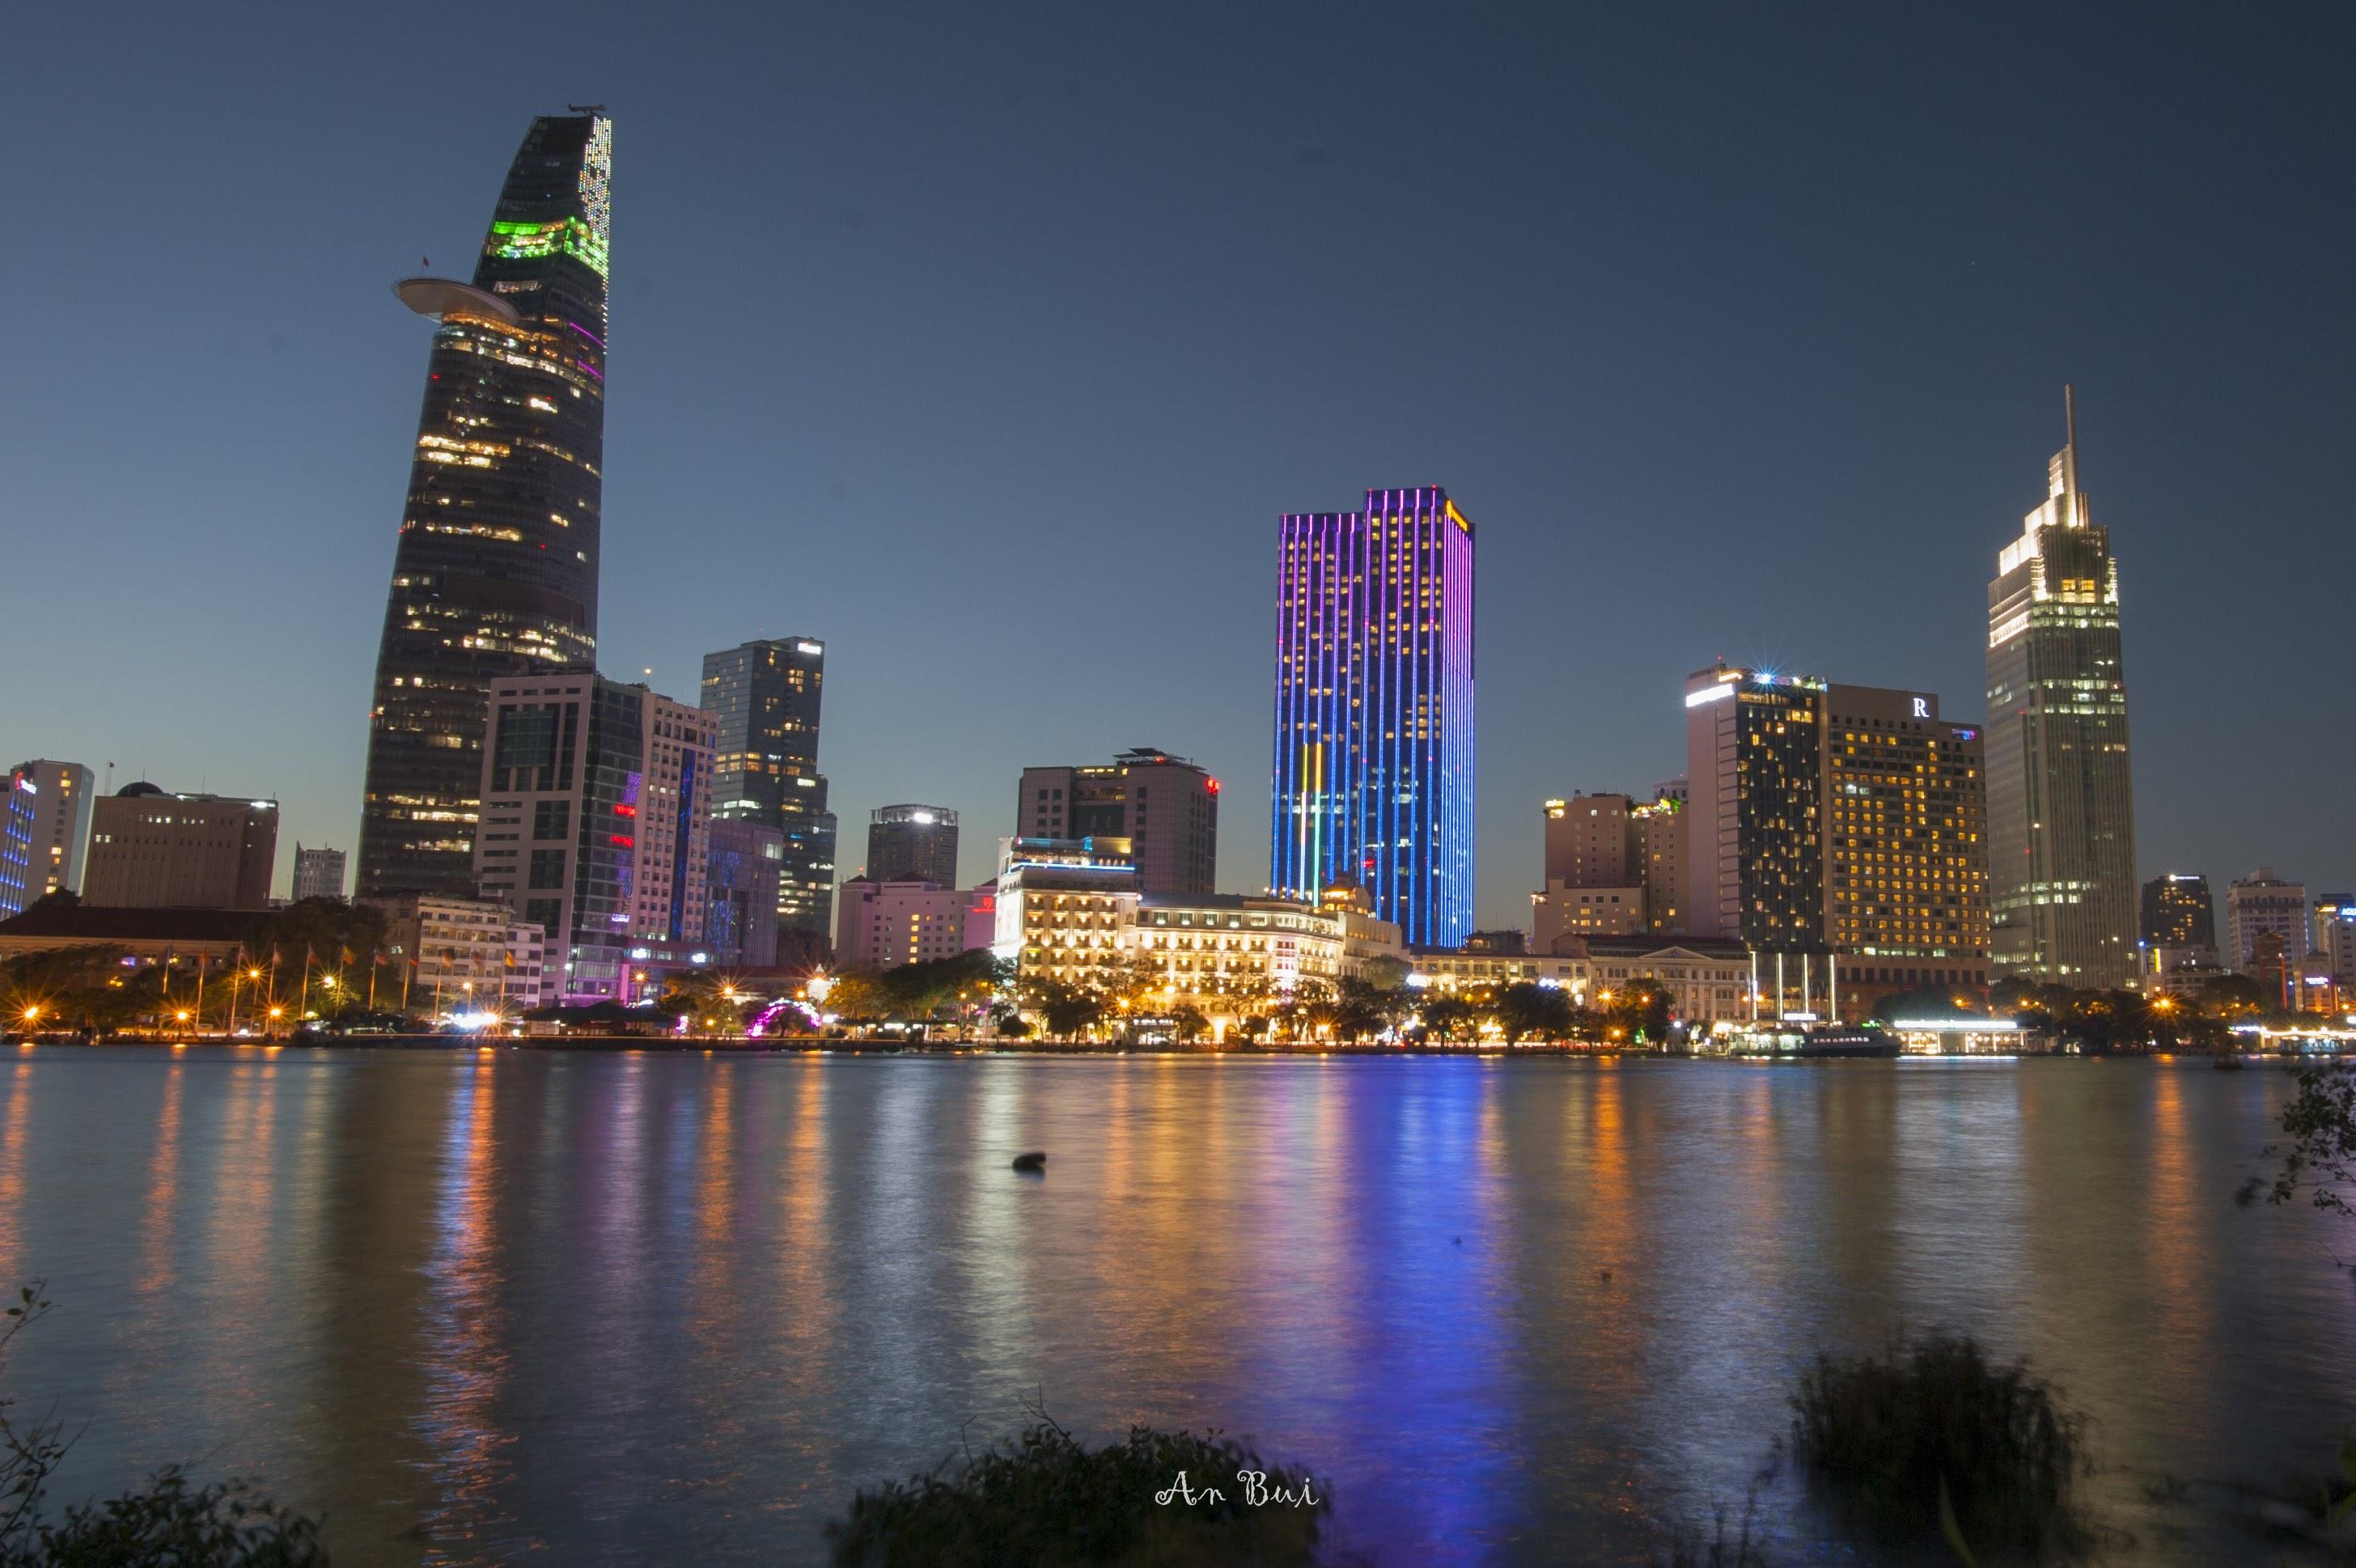 Sunset Photography in Saigon